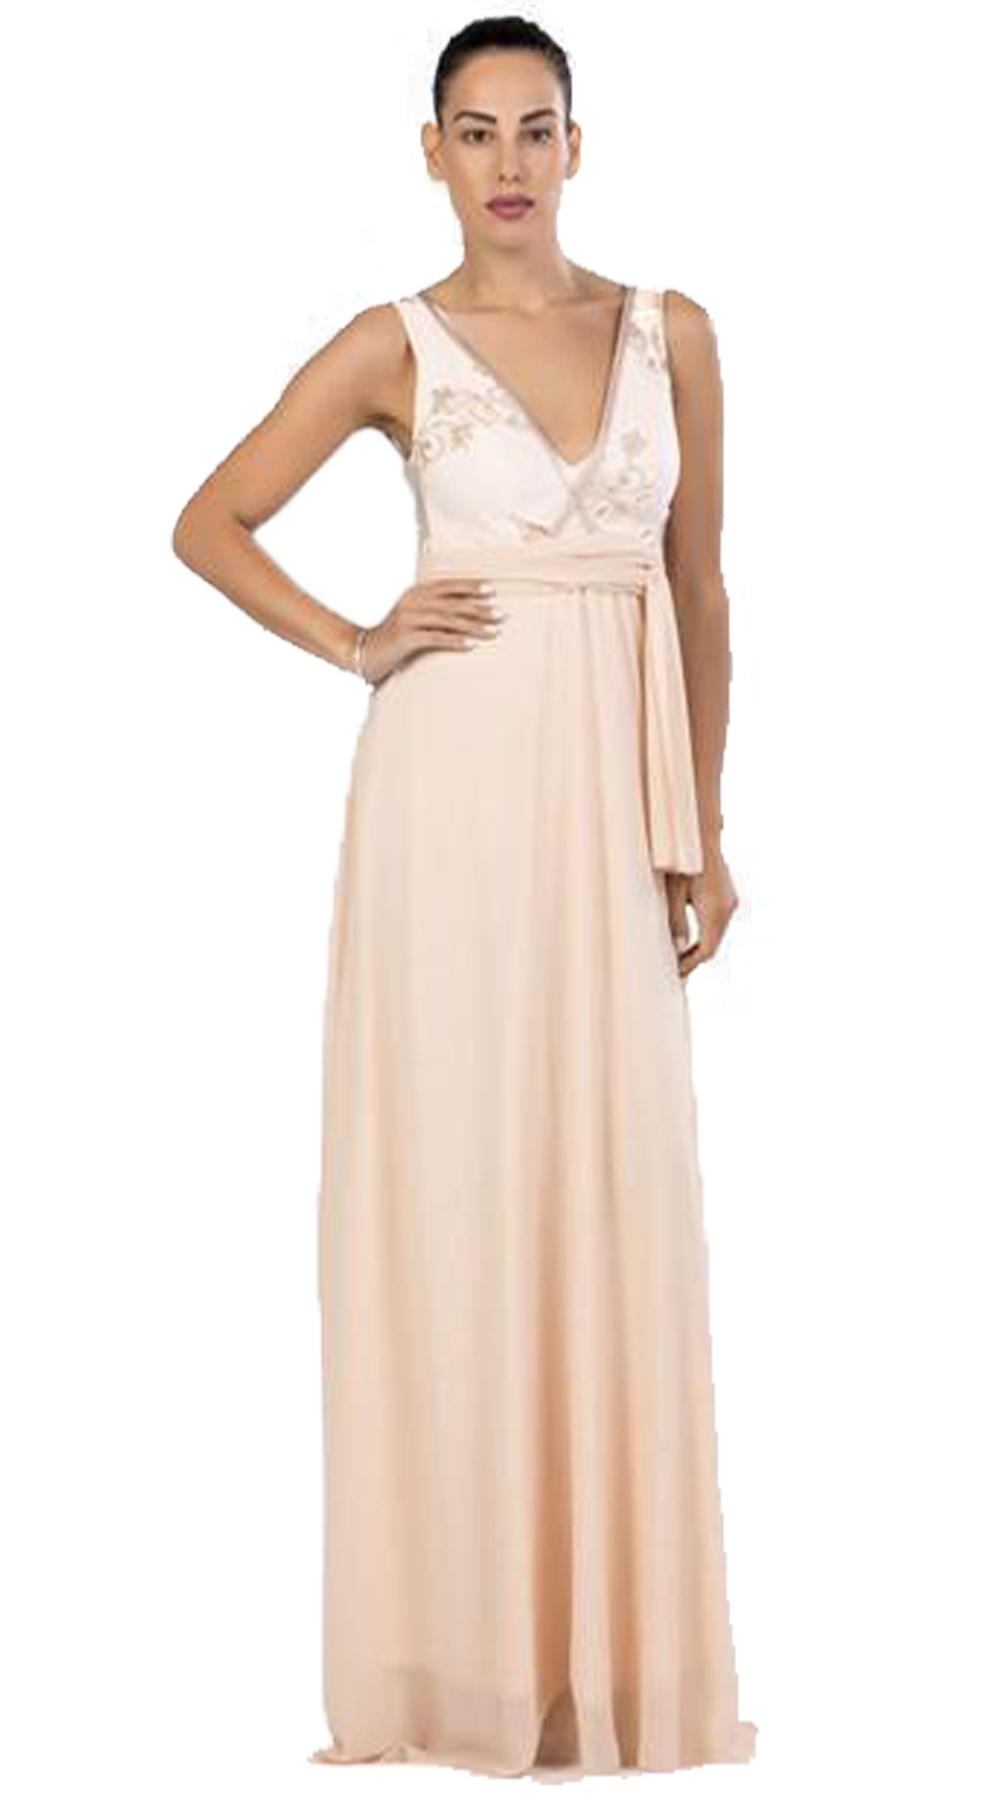 a93c6516756 Κομψό μάξι φόρεμα σε αρχαιοελληνική γραμμή με άνοιγμα στην πλάτη | Βραδινά  φορέματα απο τη MissReina | missreina.com